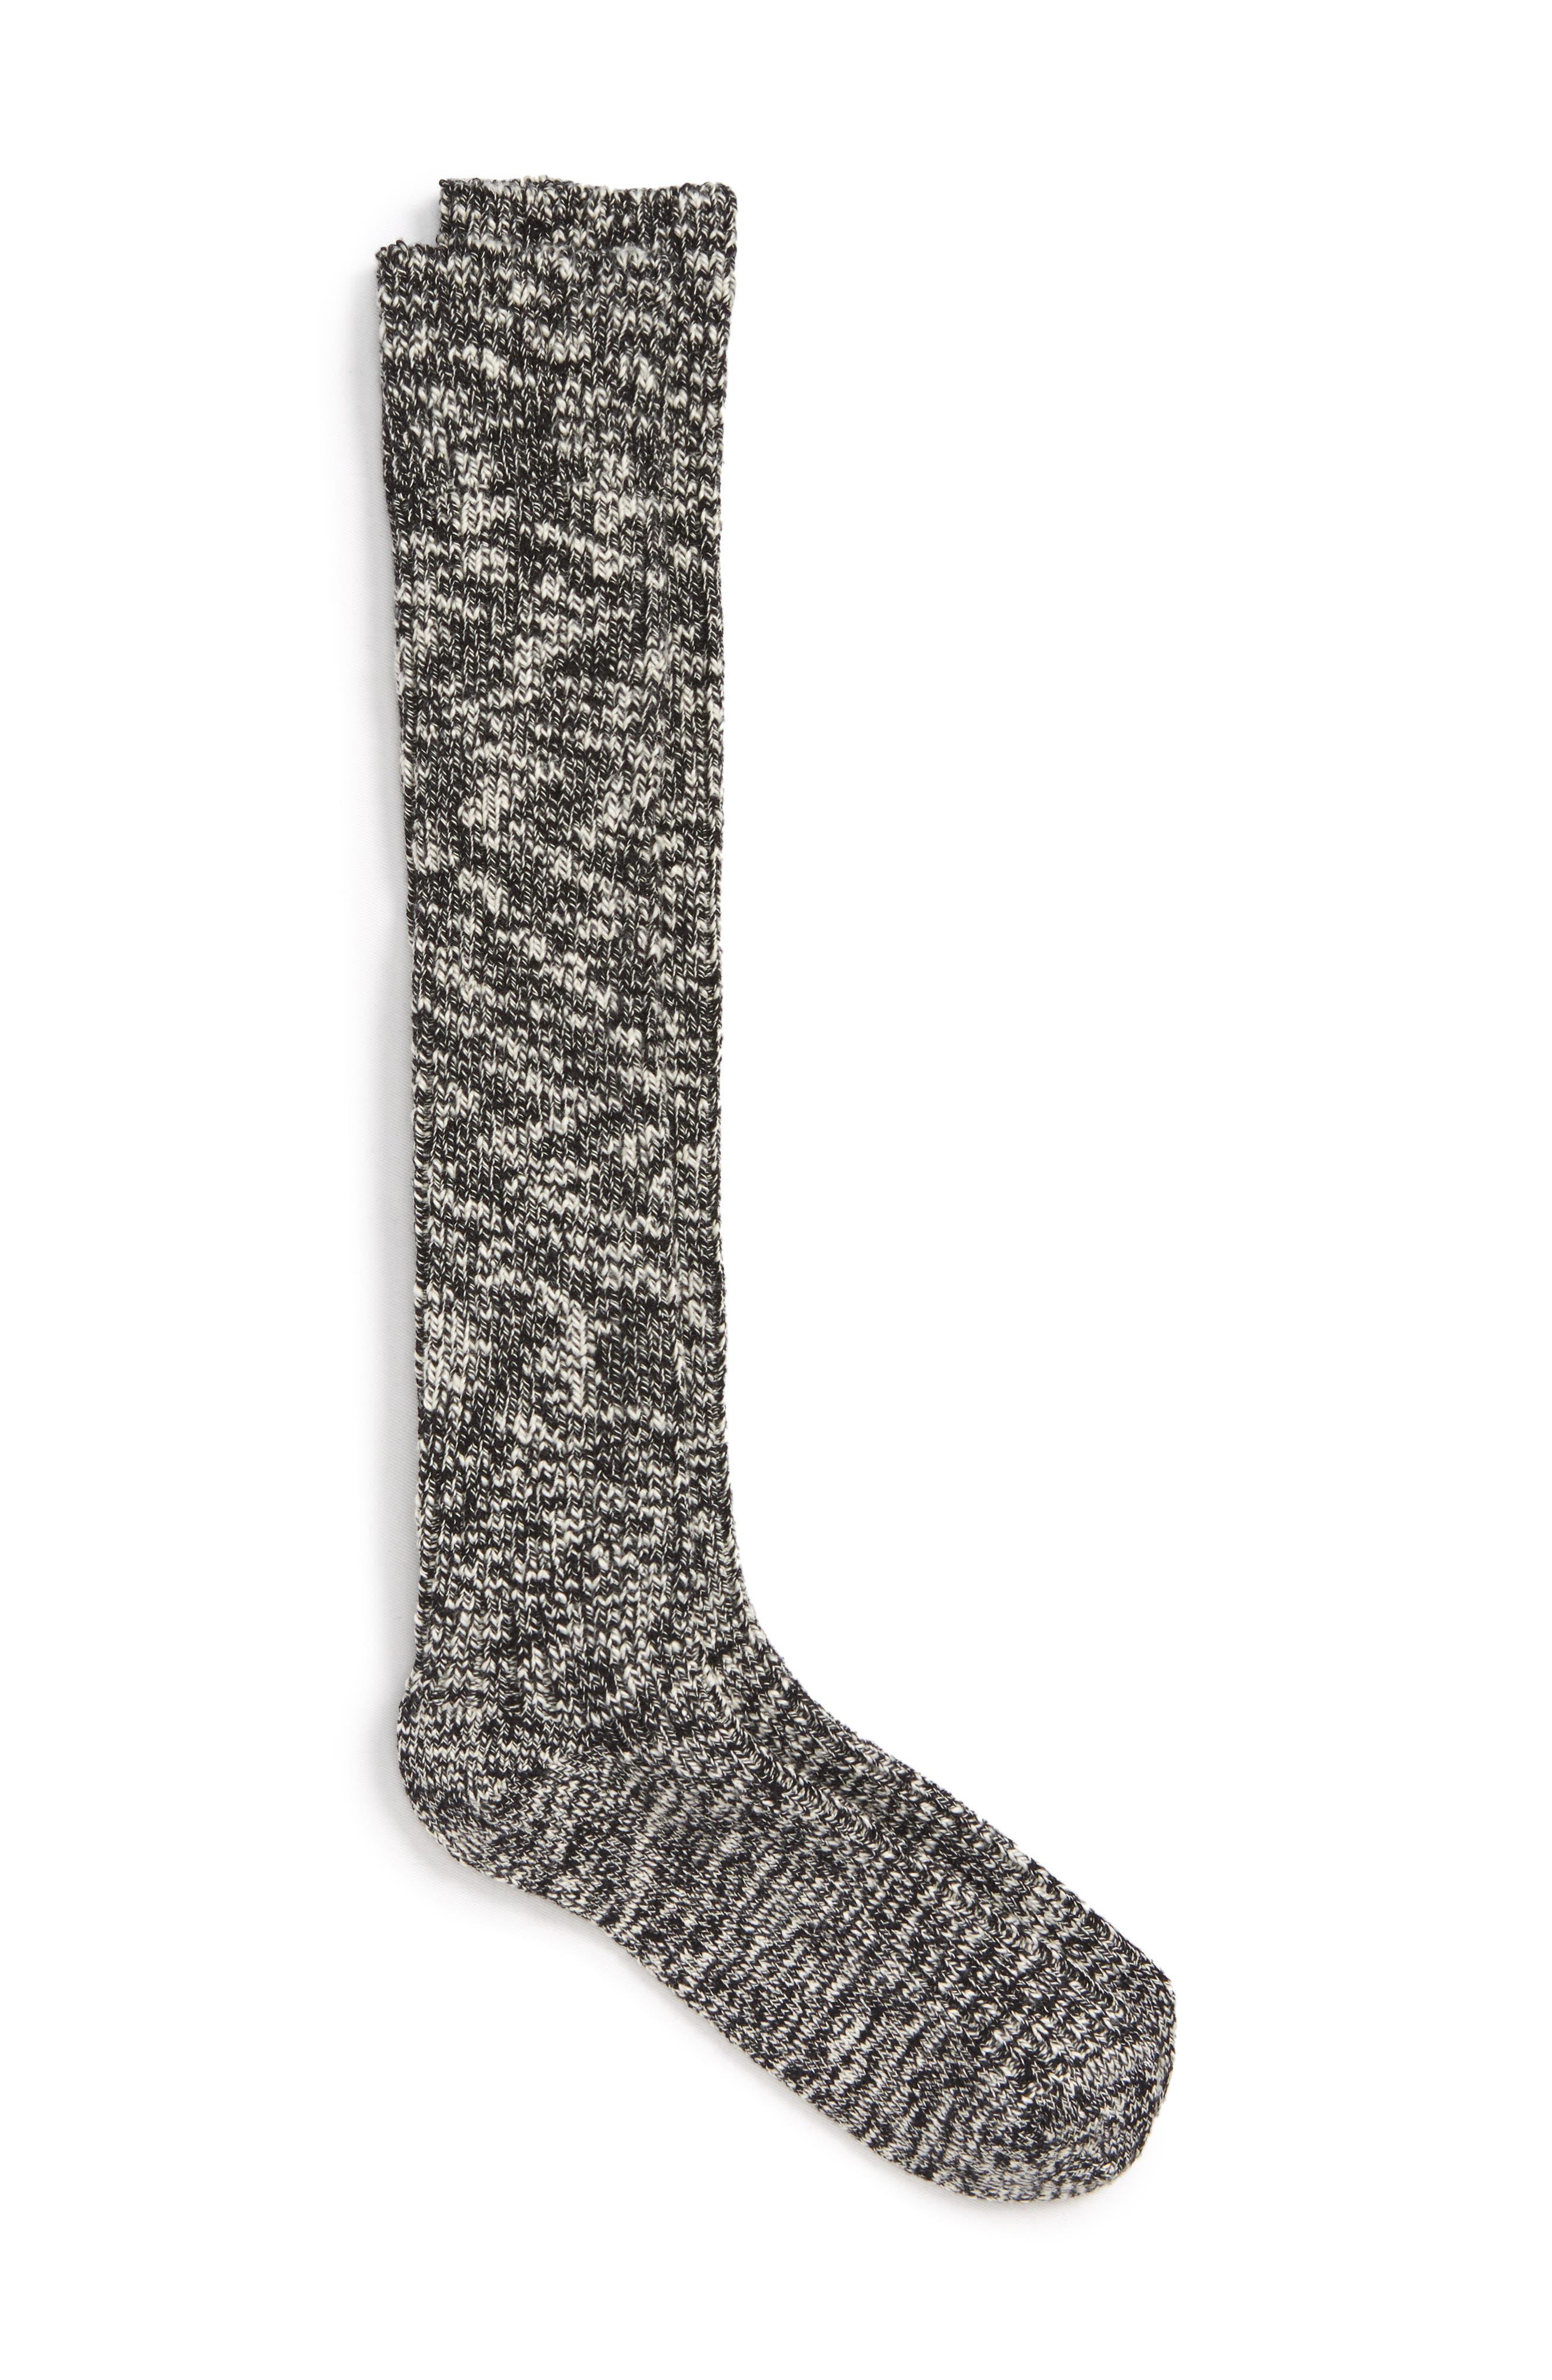 Rick Owens x Birkenstock Tall Socks,                         Main,                         color, Melange Heather